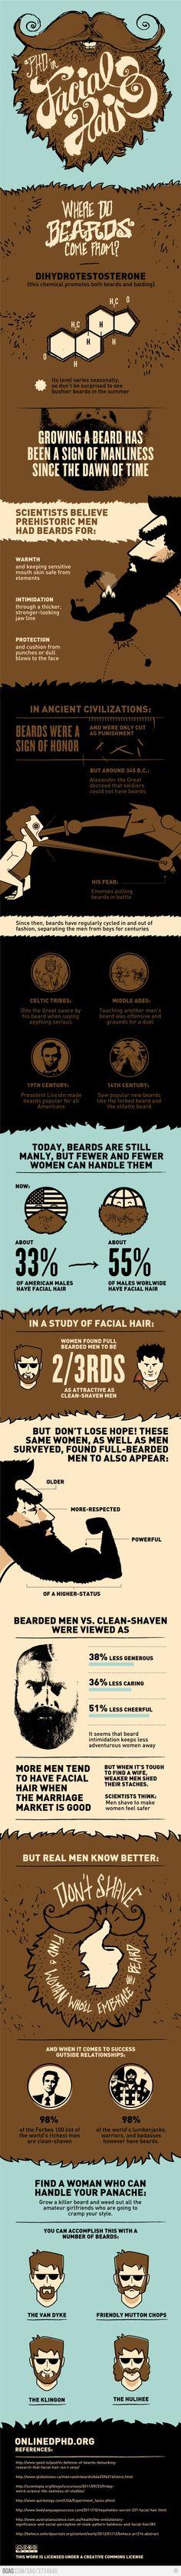 The history of Bear/Real Man